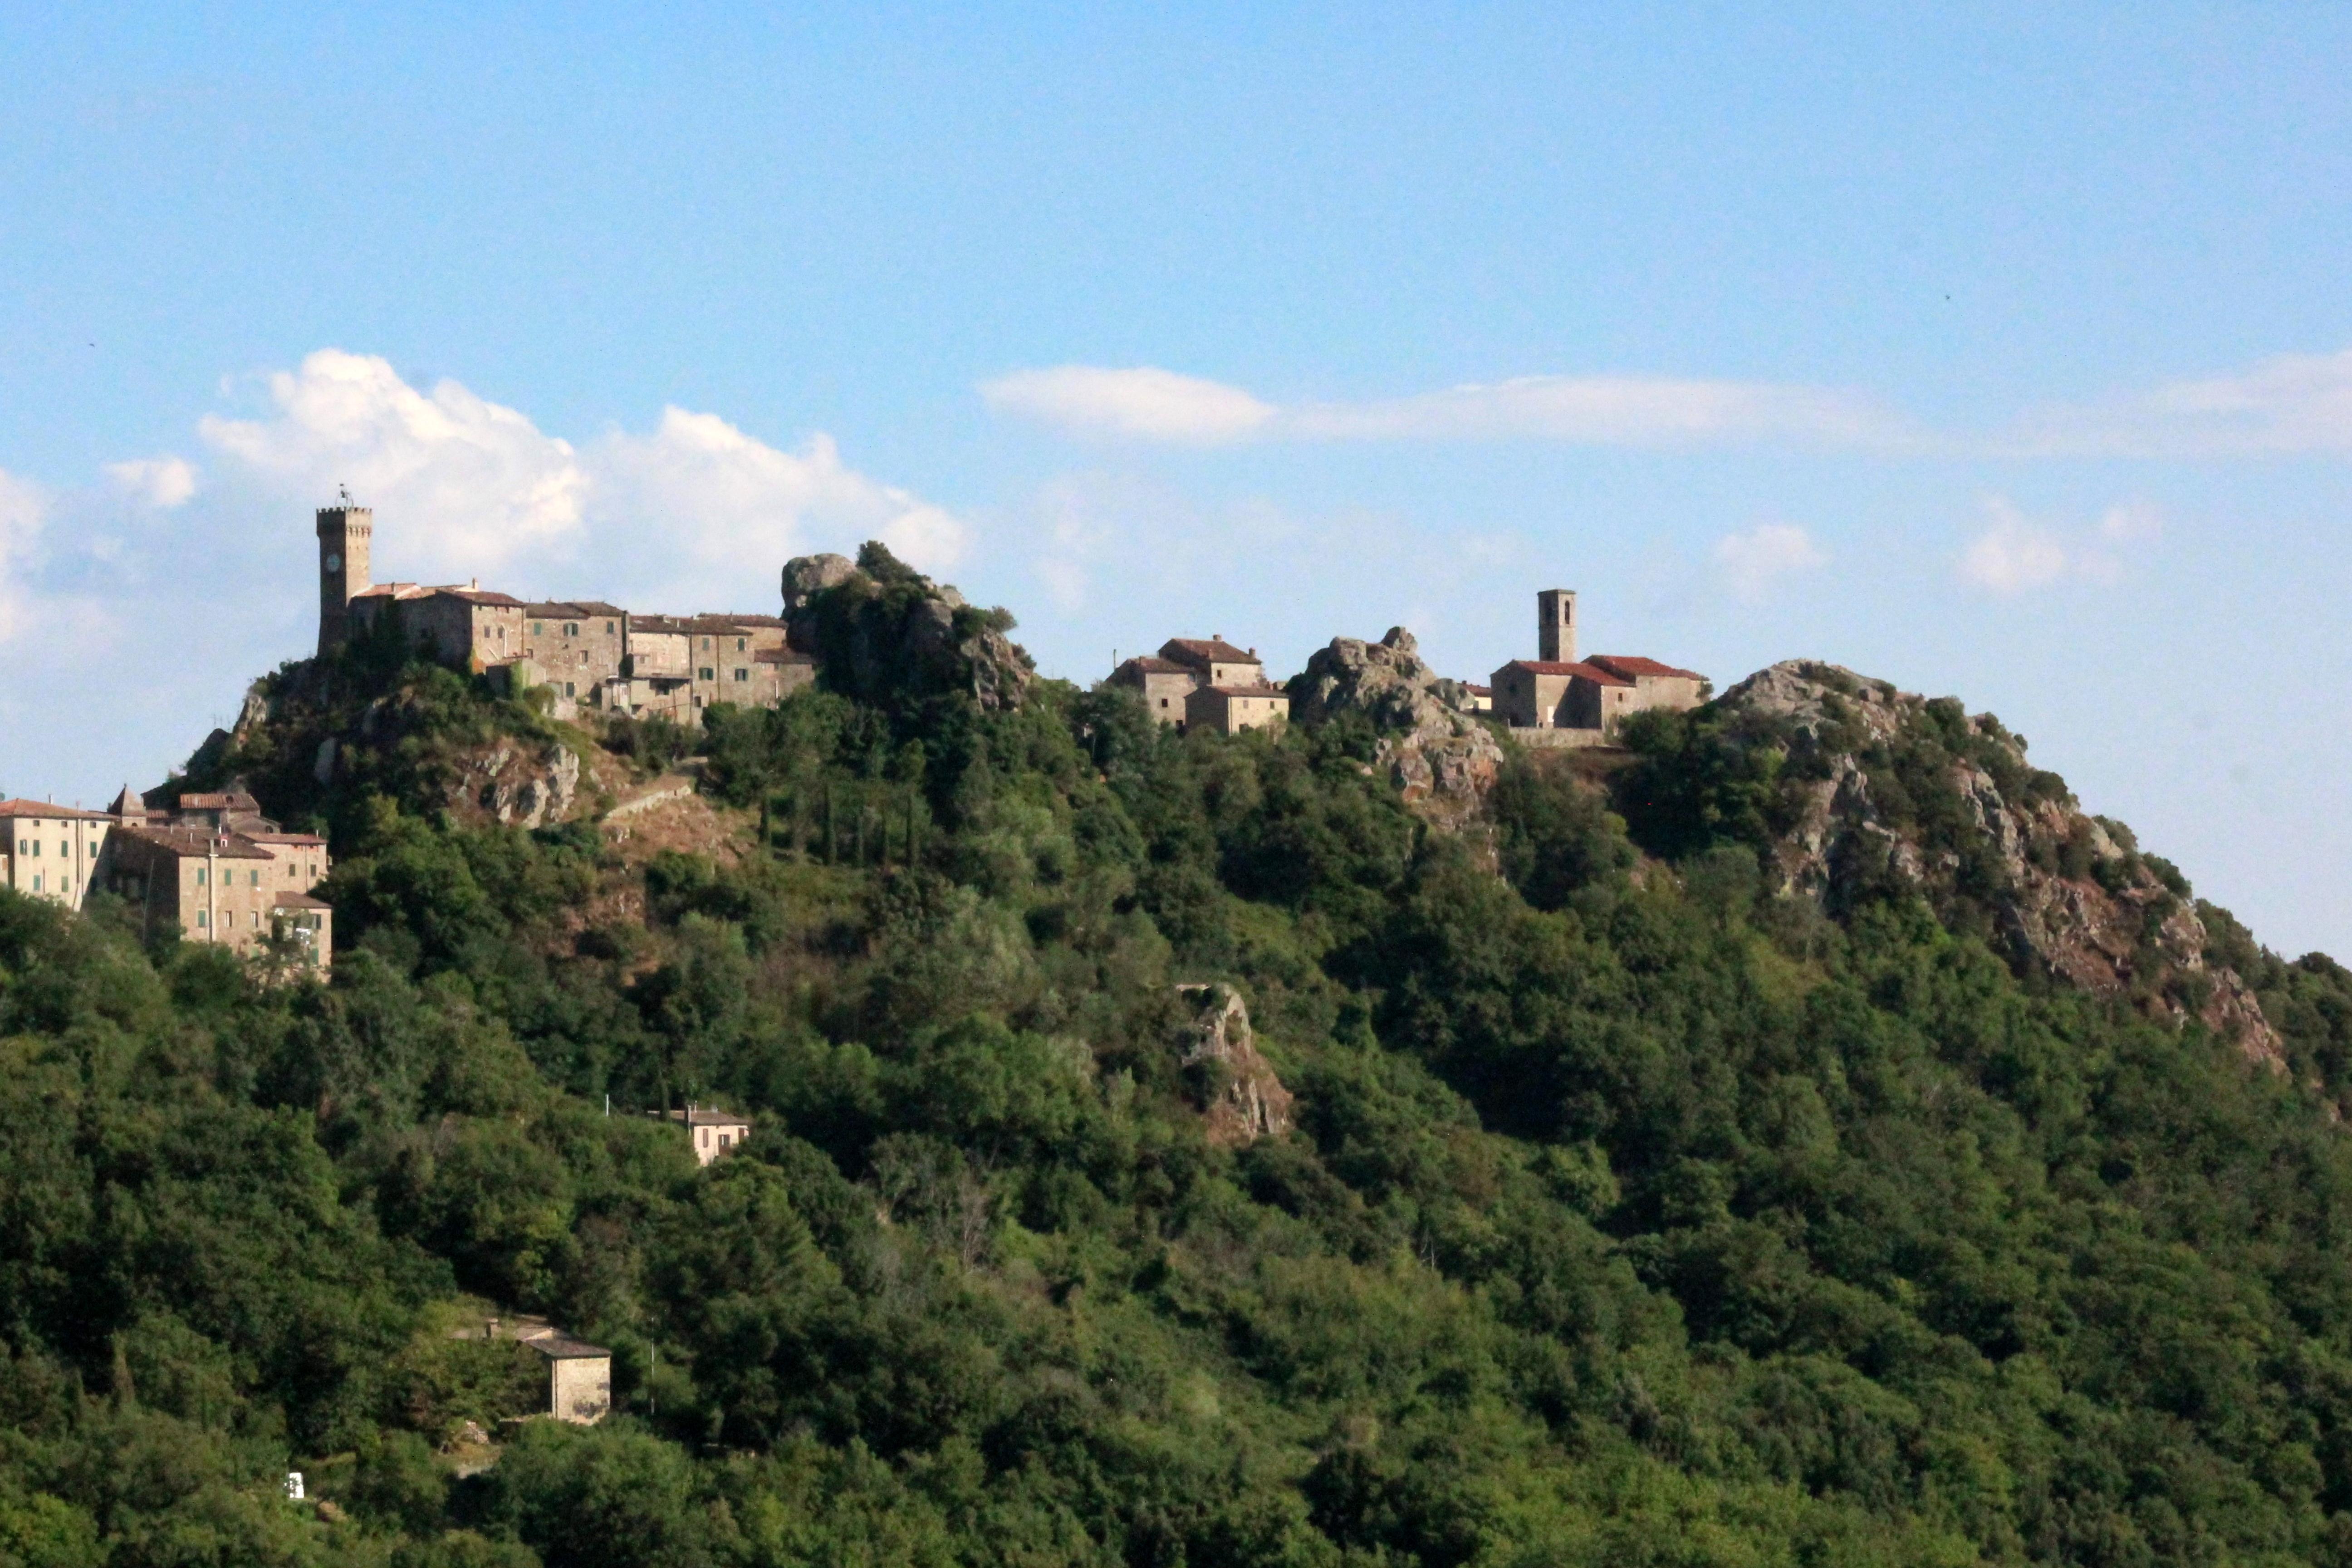 RoccatederighiPanorama2.jpg